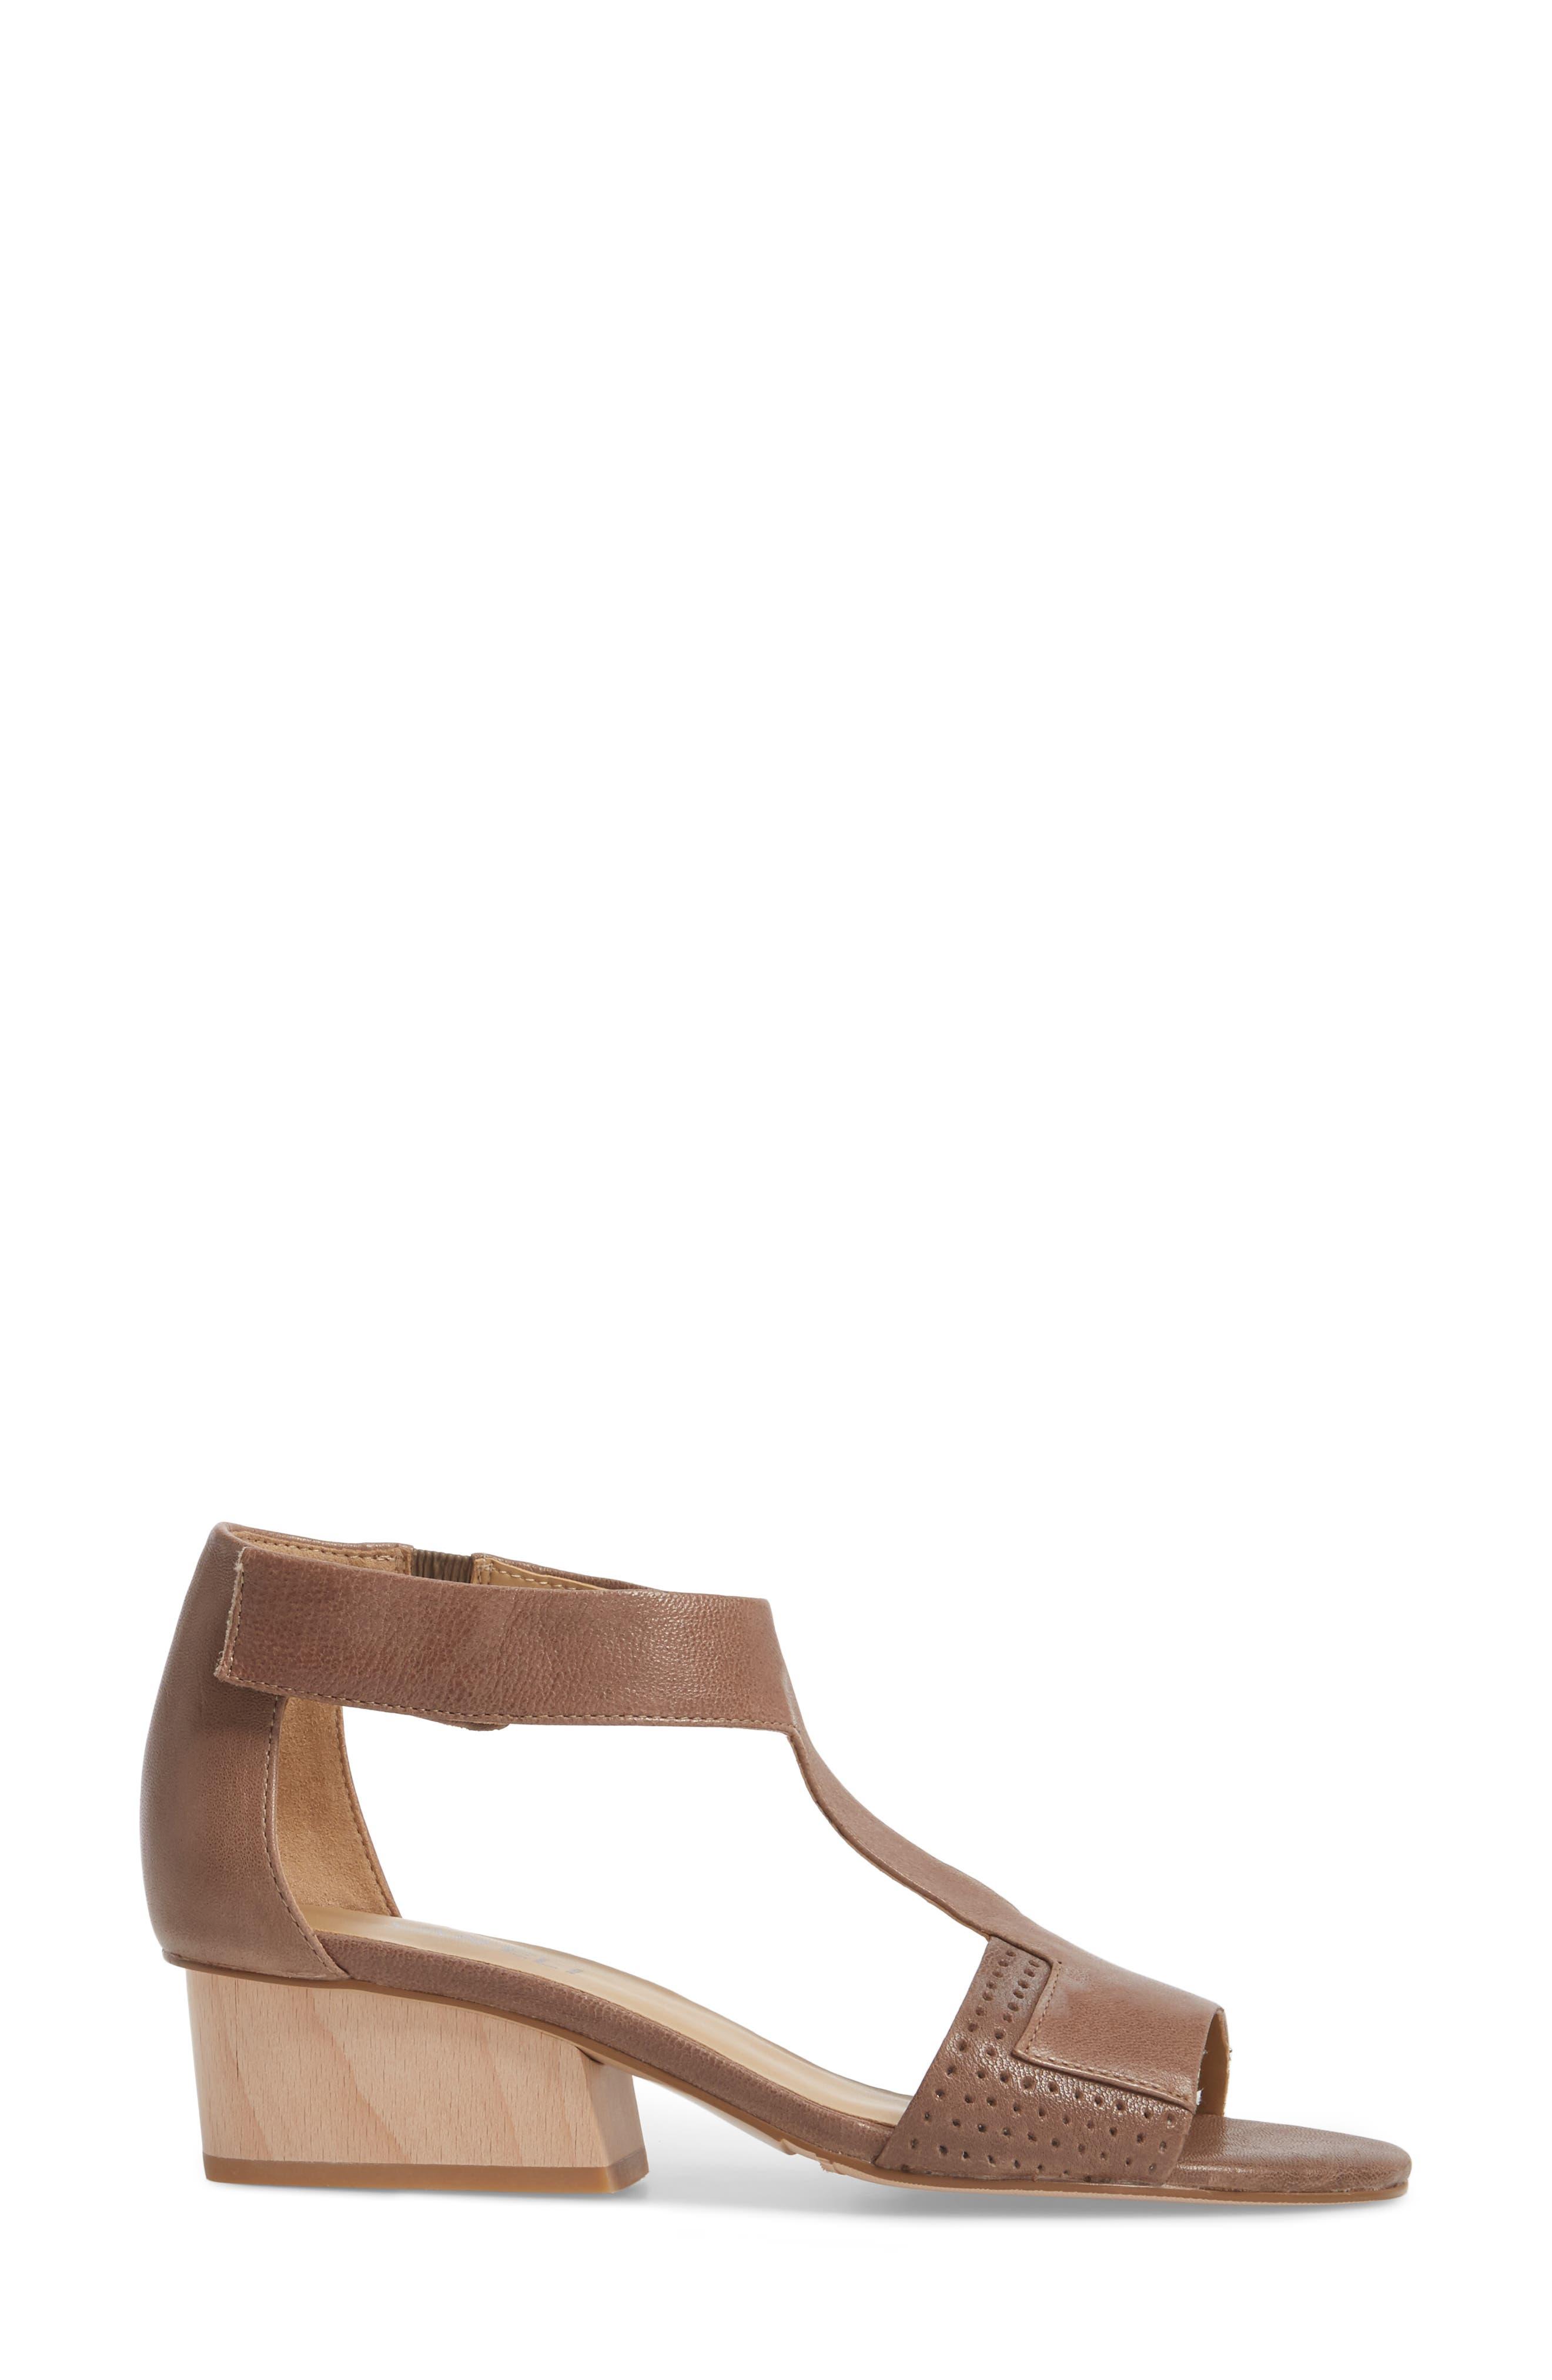 VANELI, Calyx Block Heel Sandal, Alternate thumbnail 3, color, STONE LEATHER